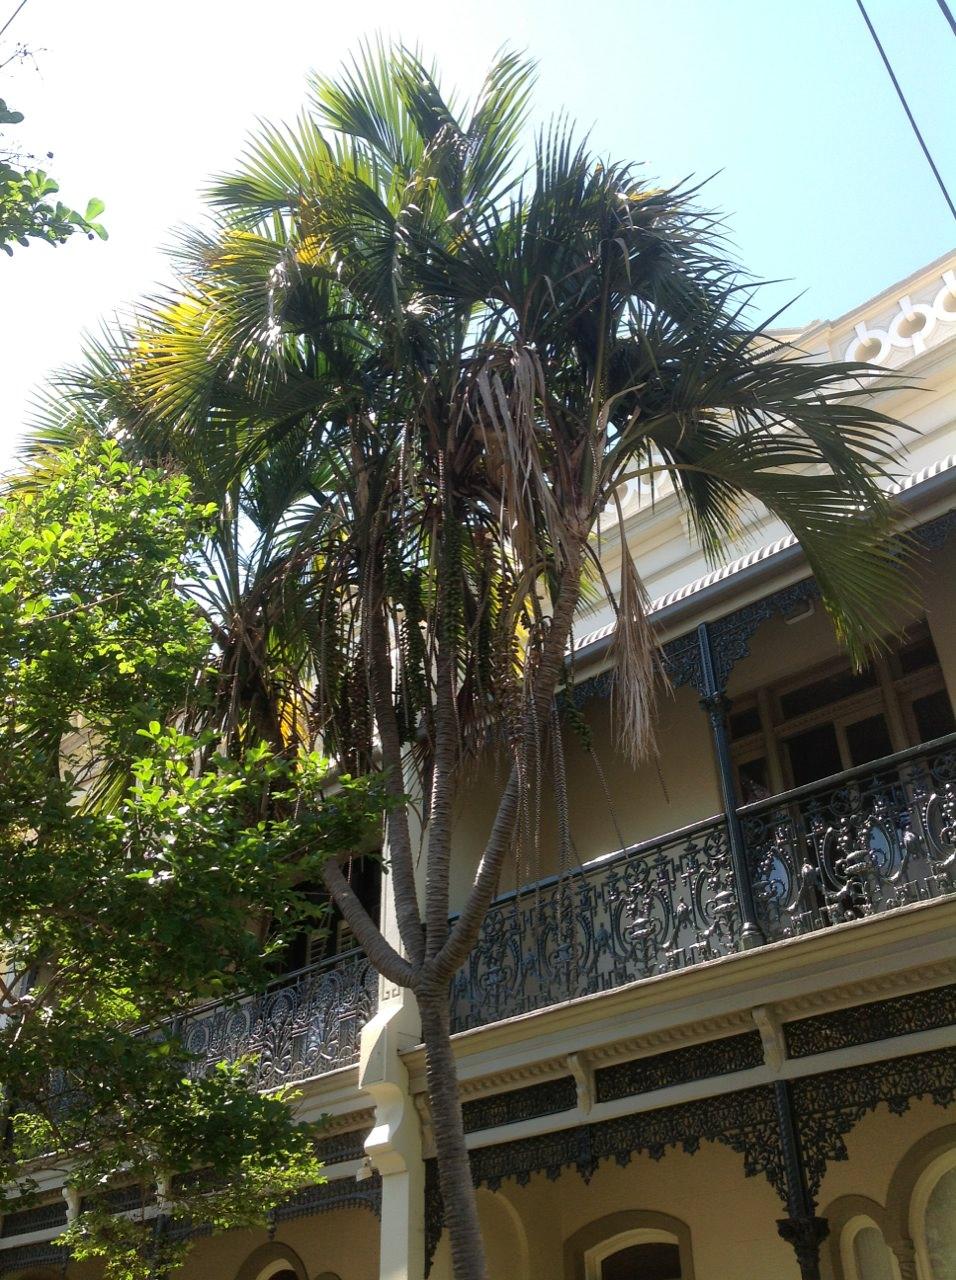 Sentry Palm